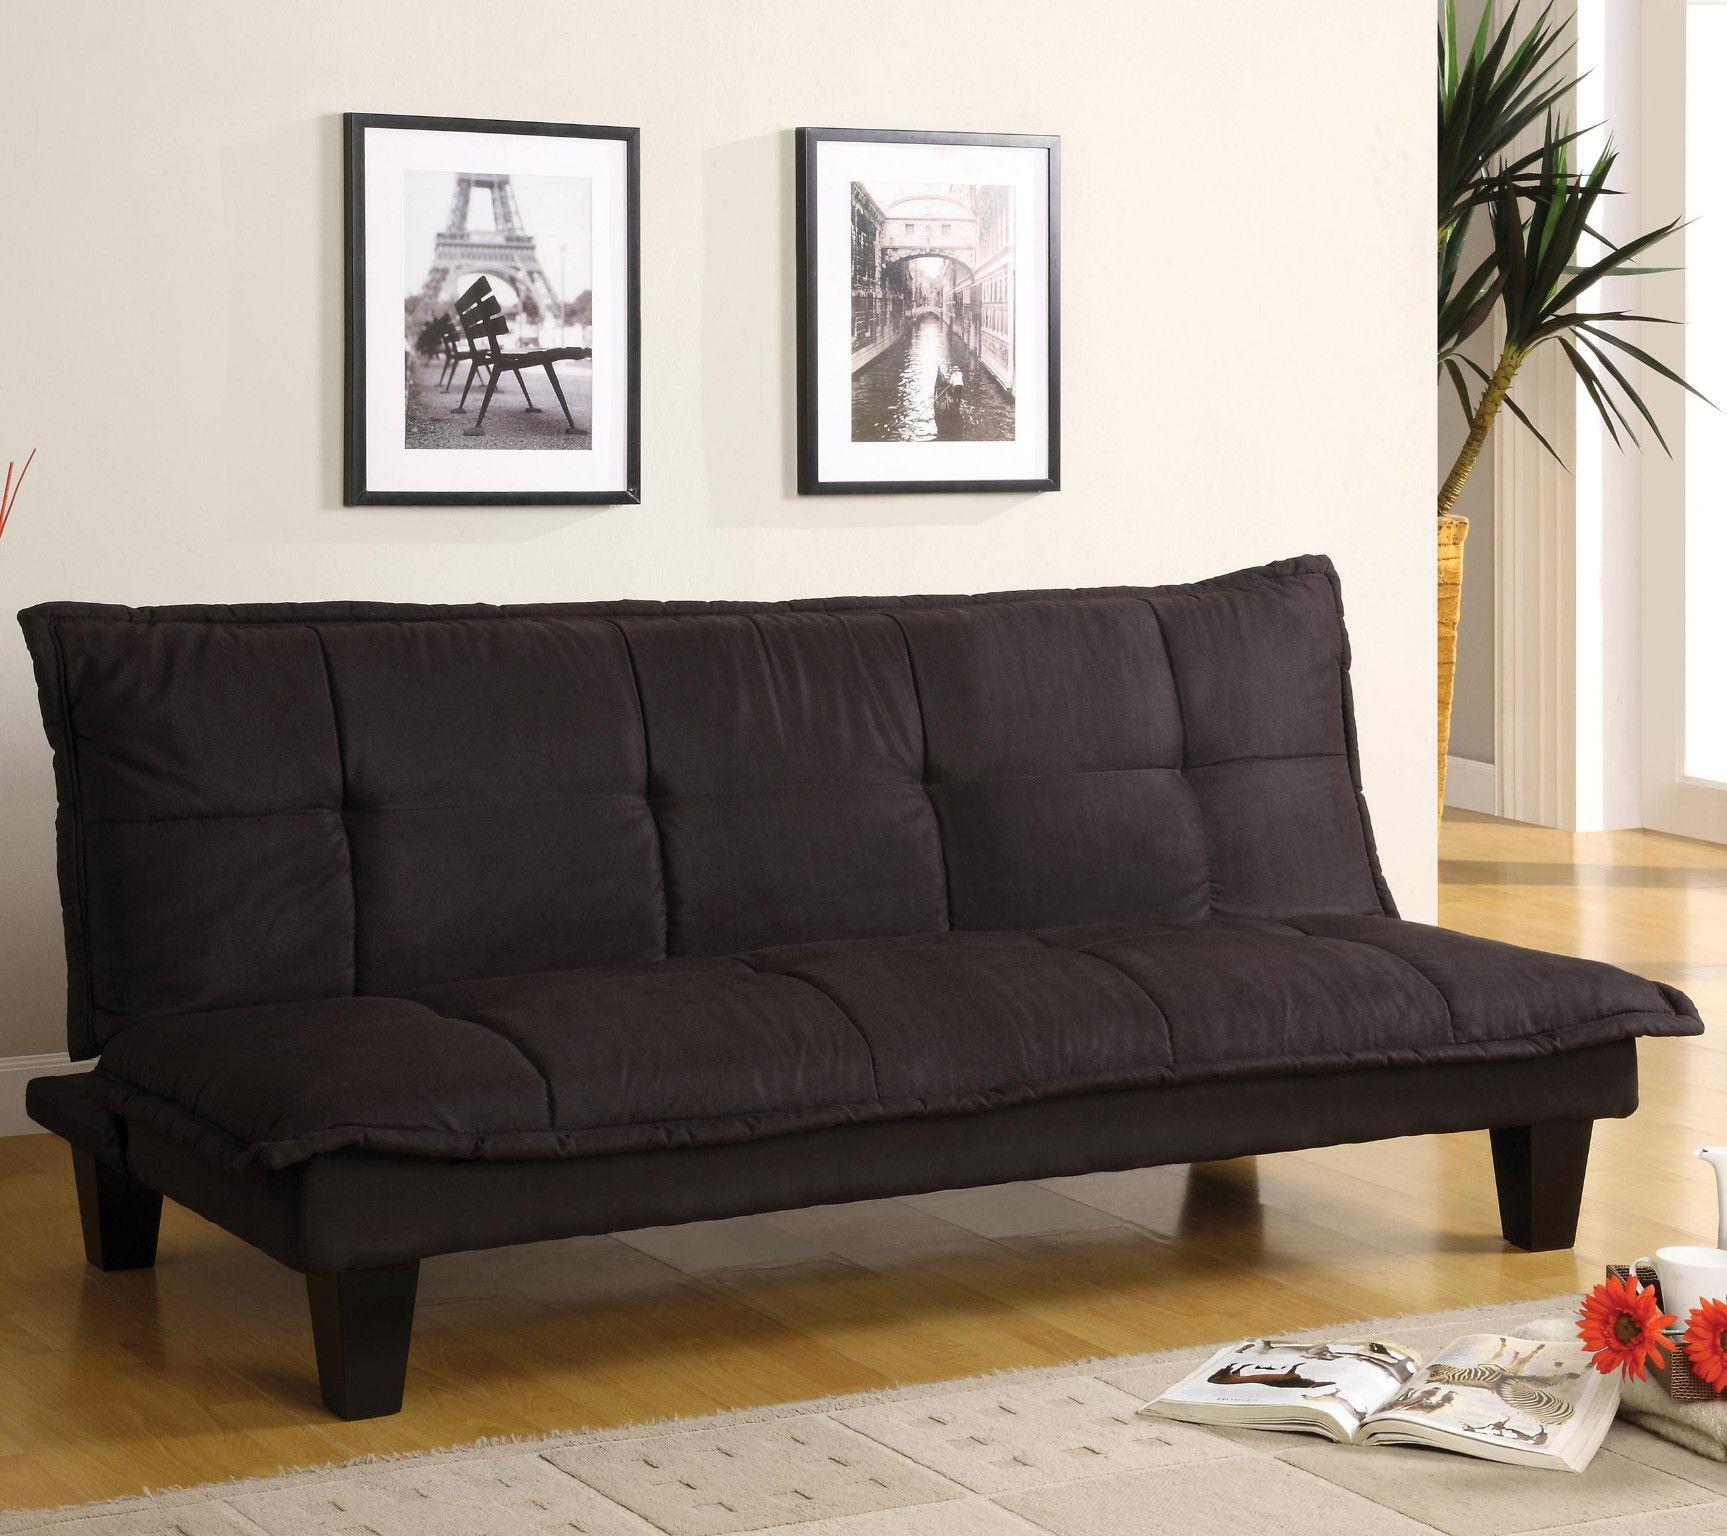 Reclining Sofa Margo Futon Sofa Bed Sofa Back Raised x